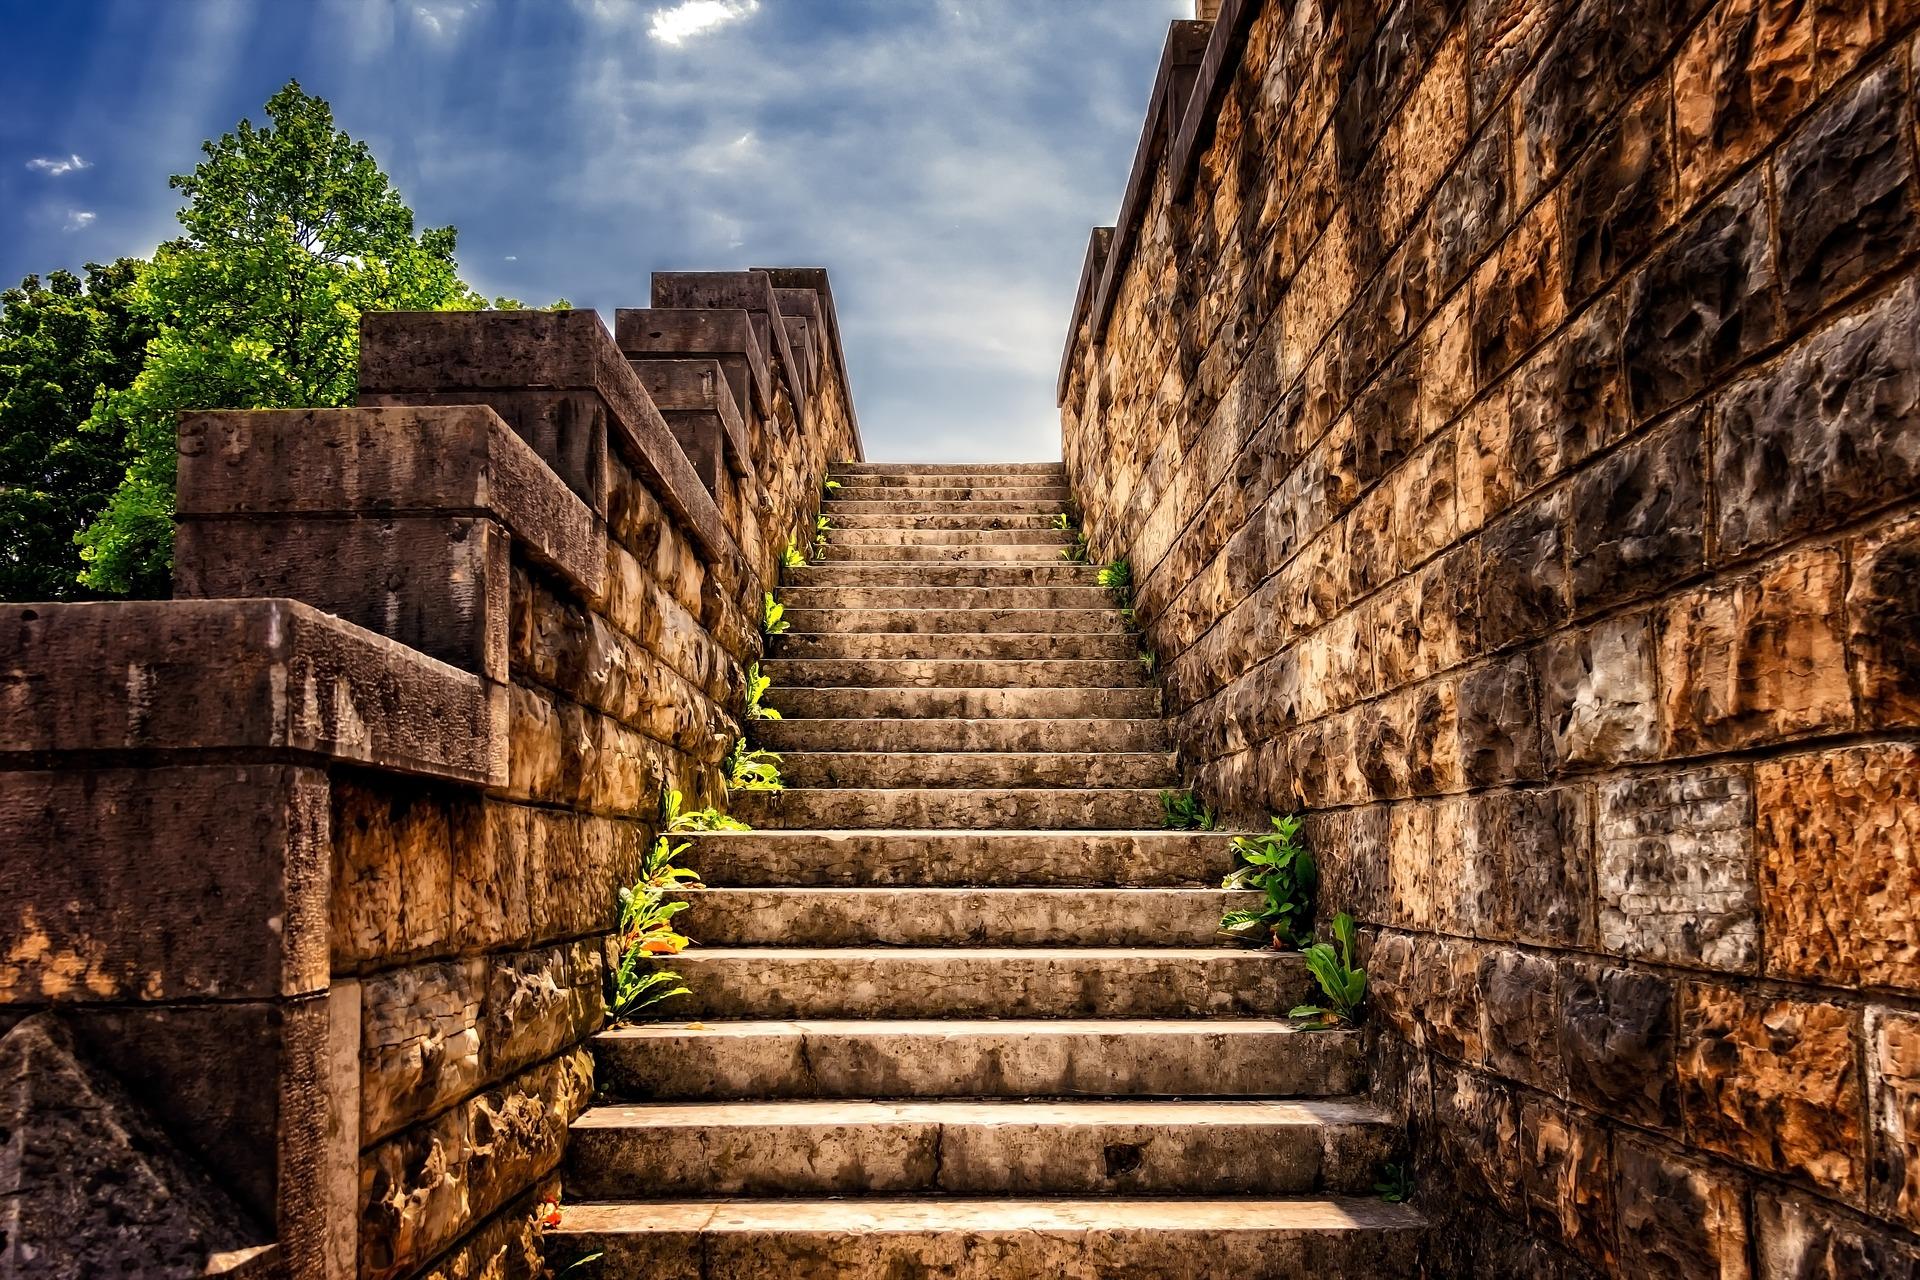 Stufen symbolisieren gute Lehrplanung